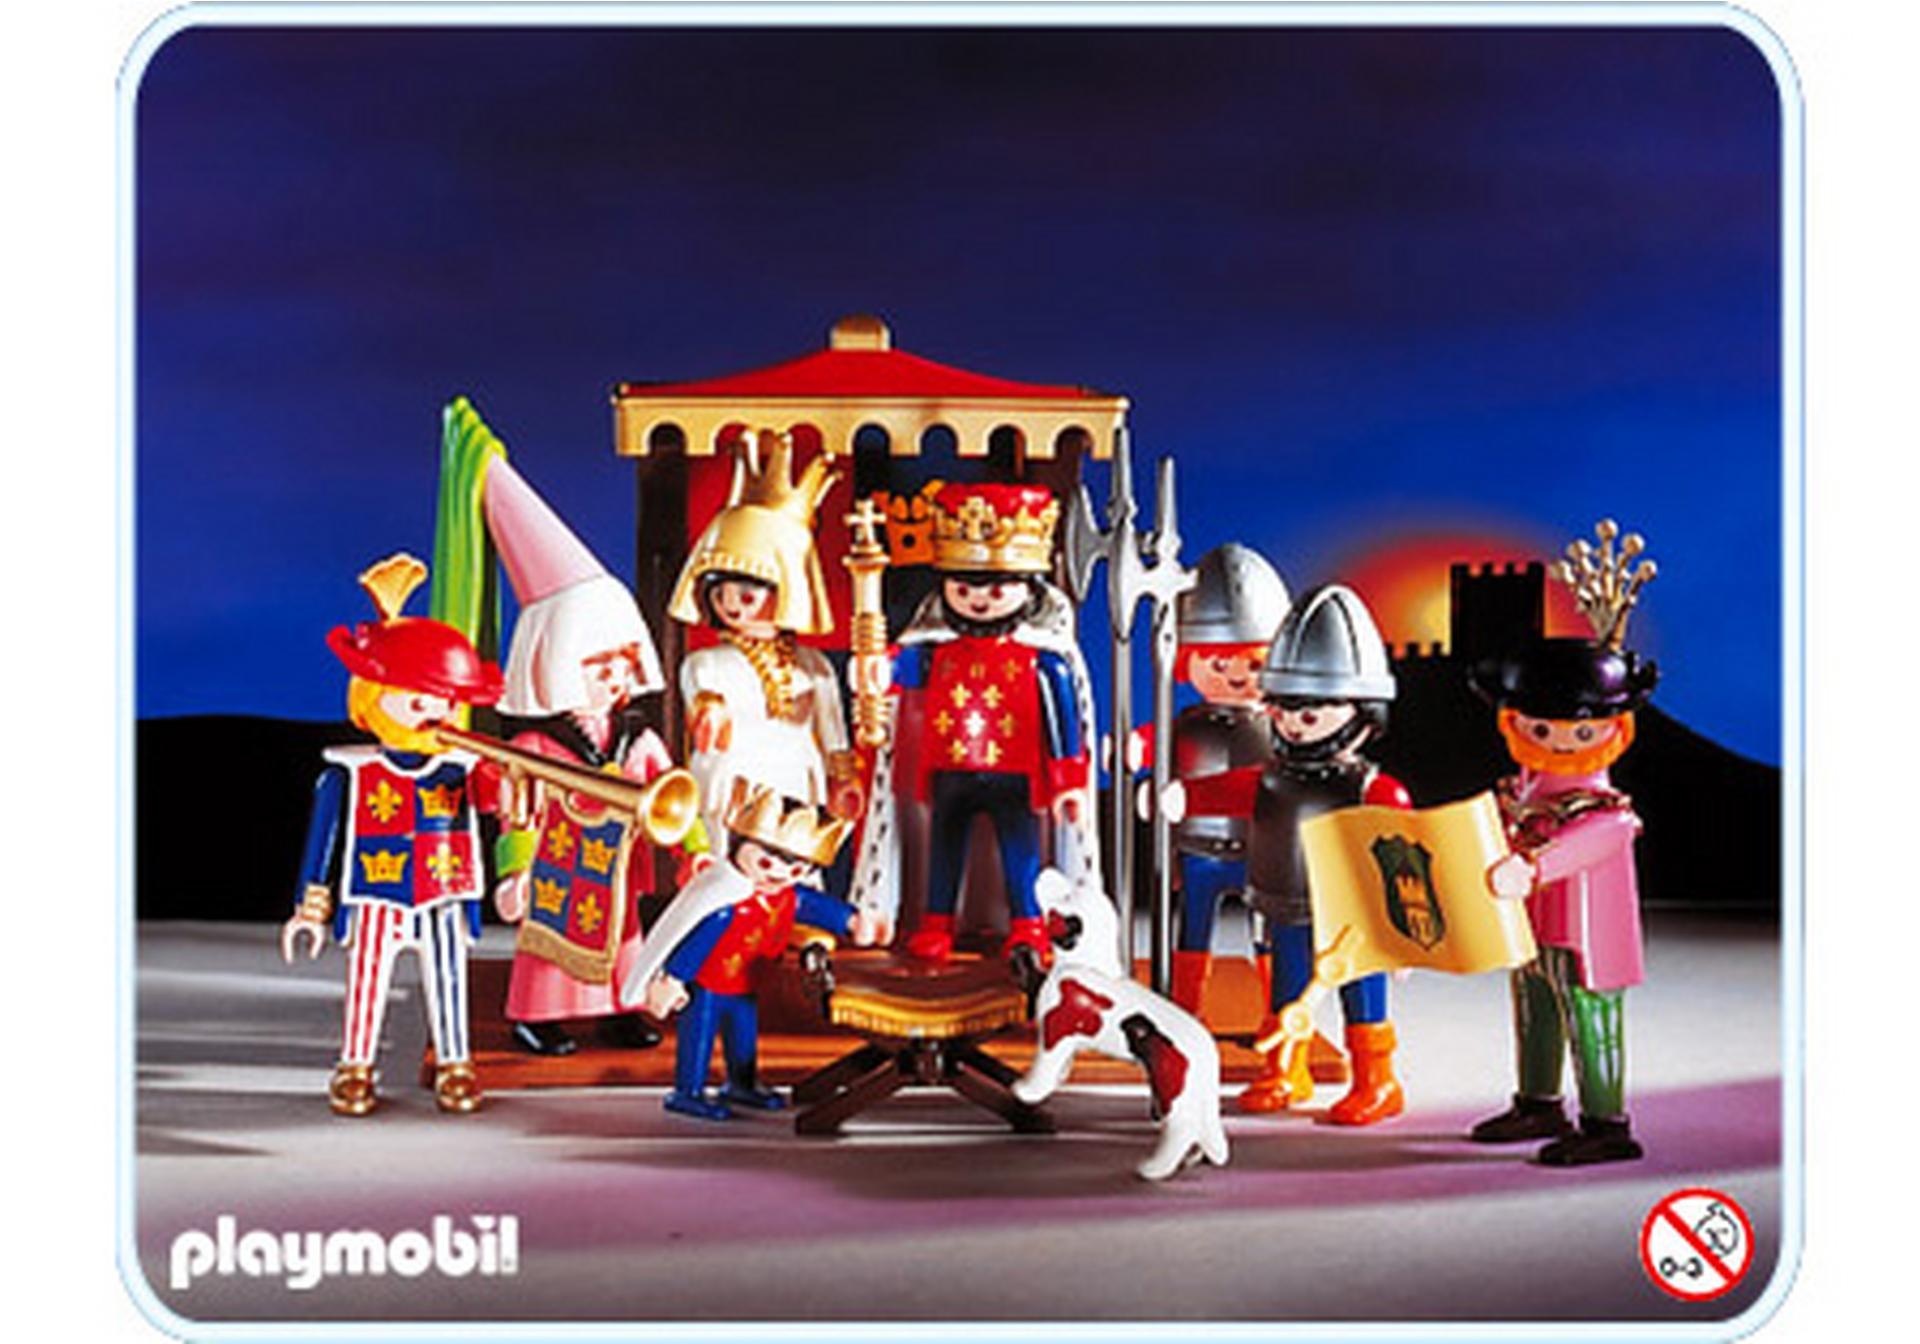 K nig hofstaat thron 3659 a playmobil deutschland for Jugendzimmer playmobil